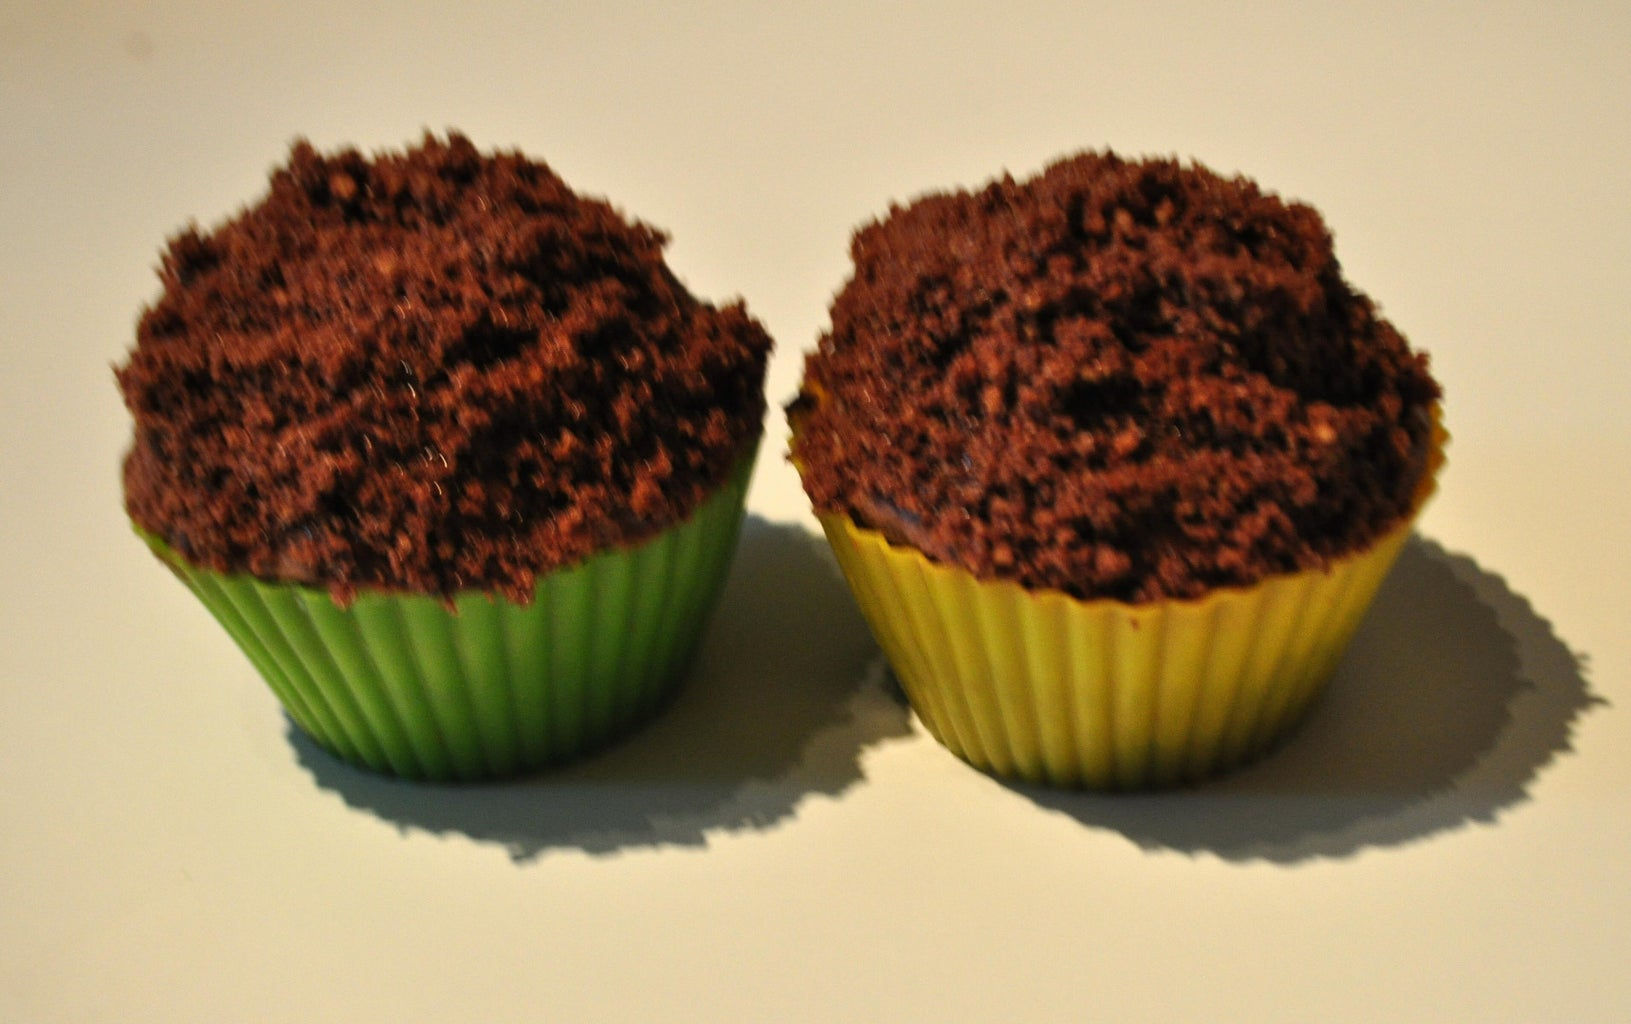 Chocolate Dirt Cupcake